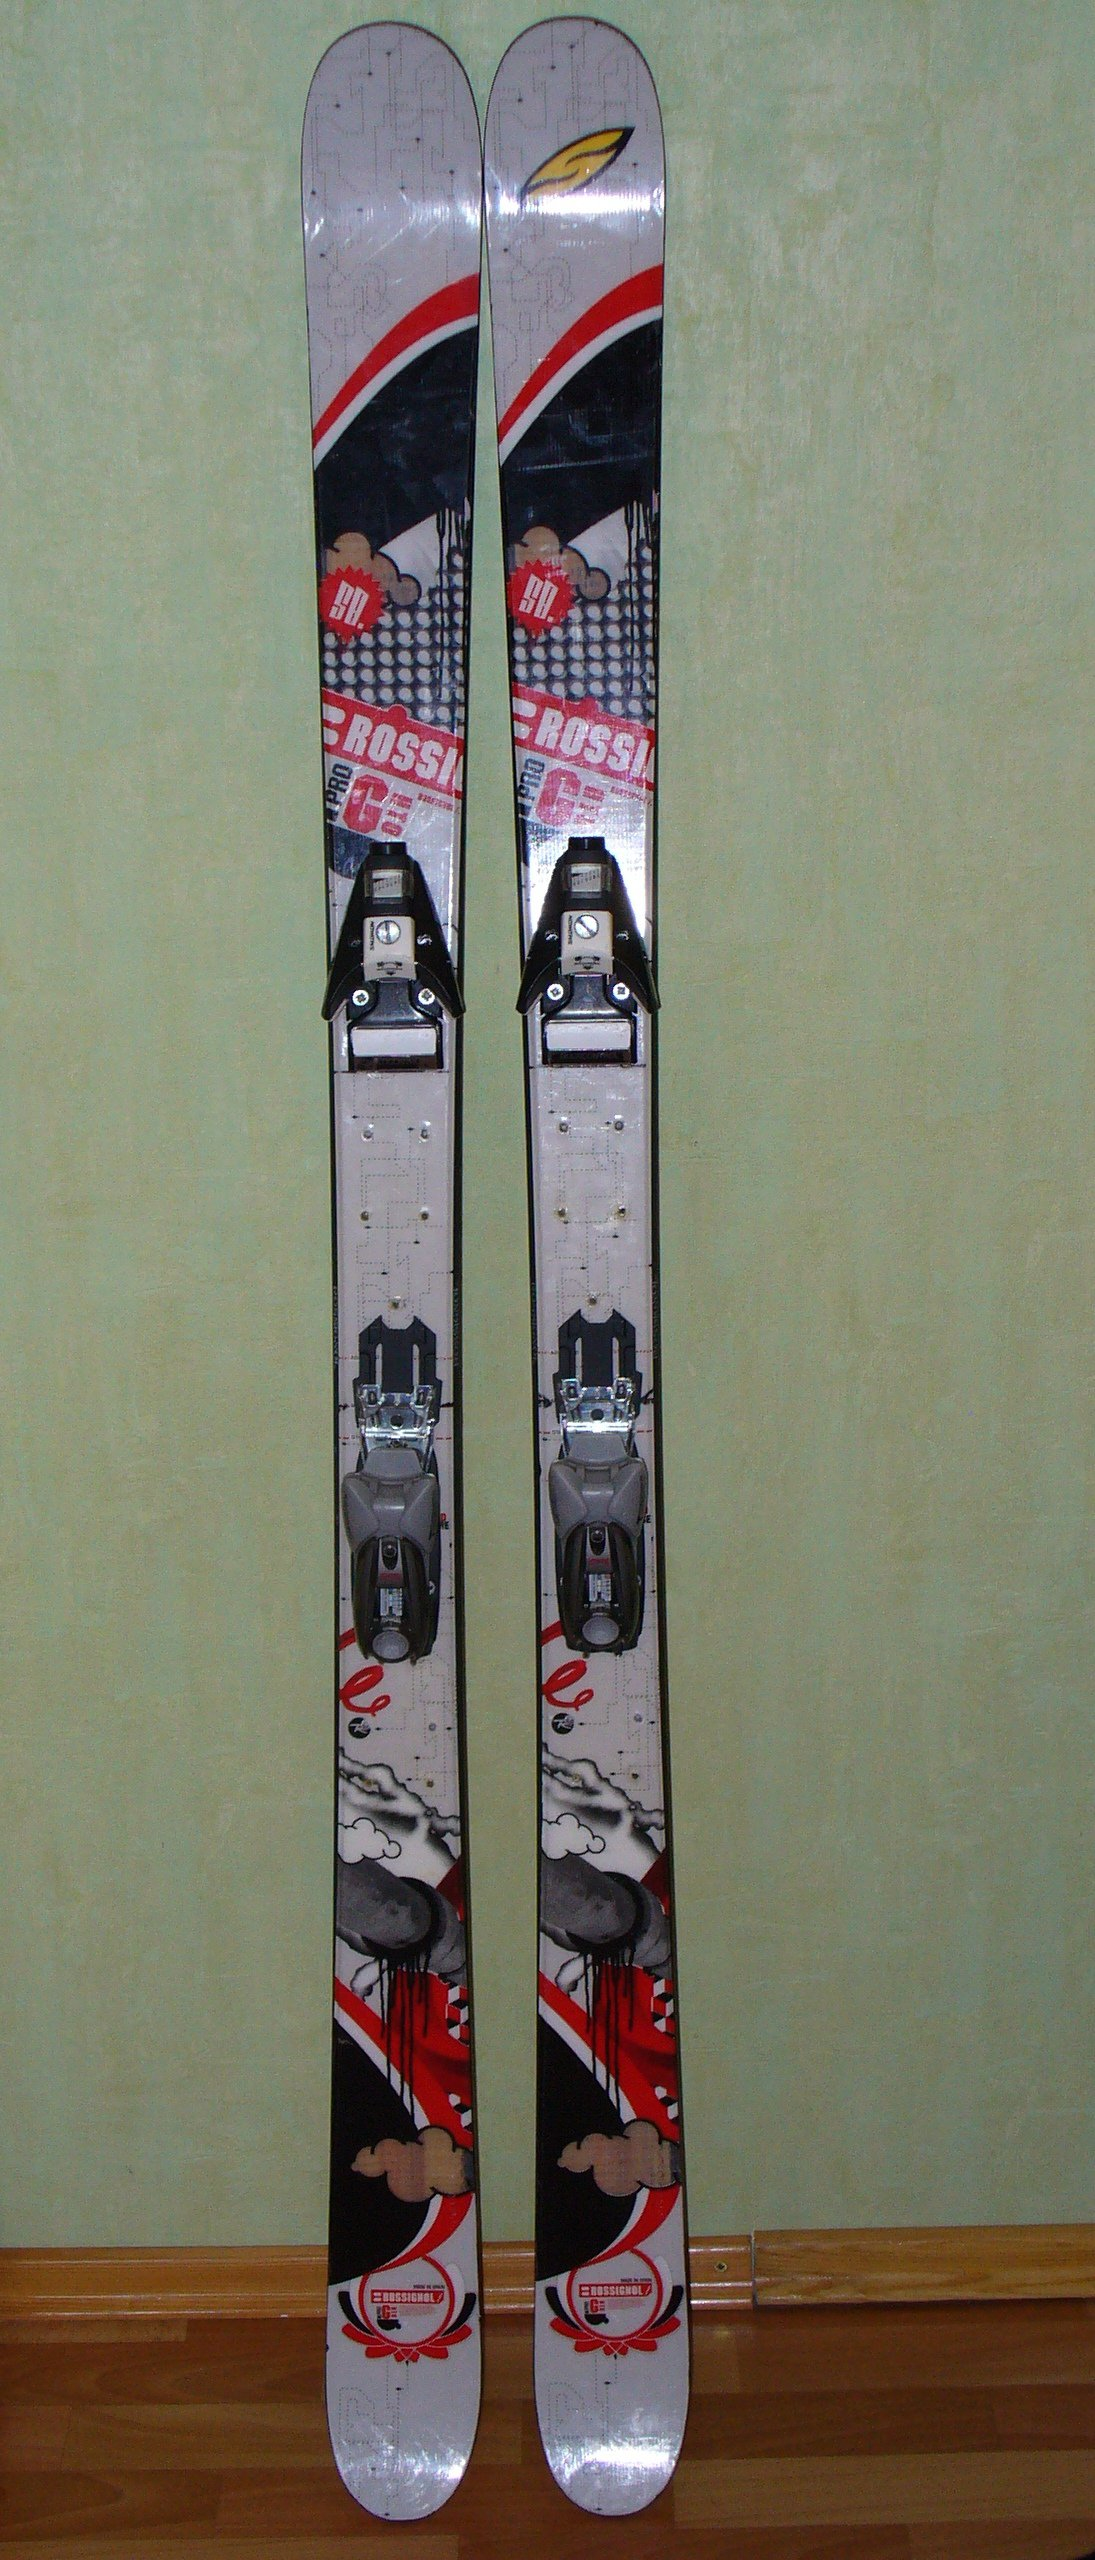 My very-old ski